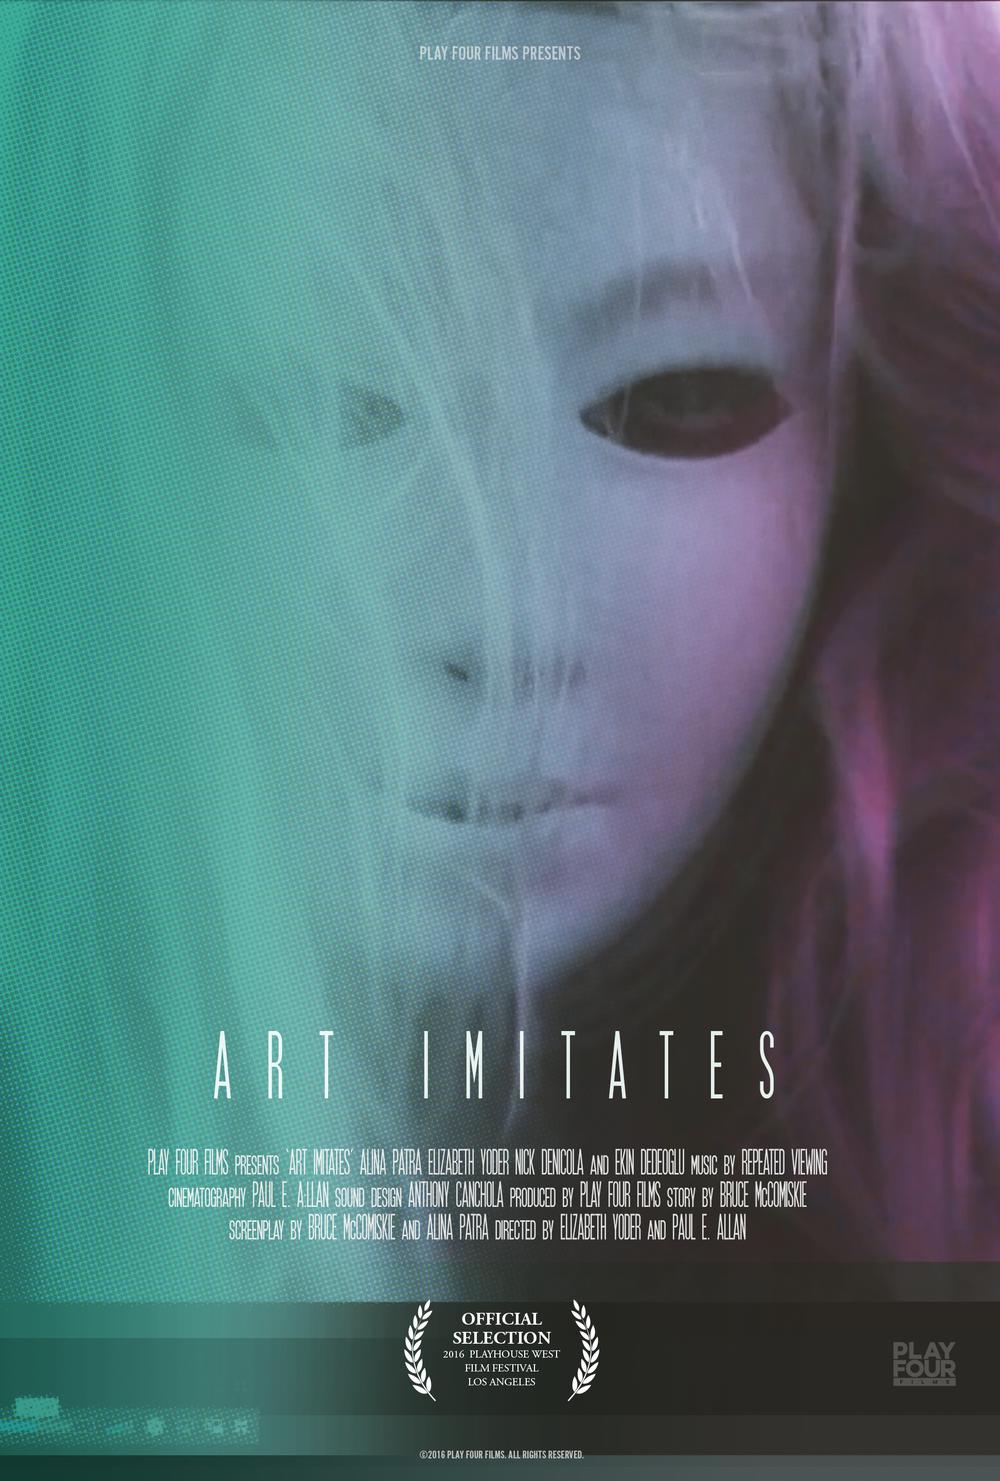 Art Imitates Poster